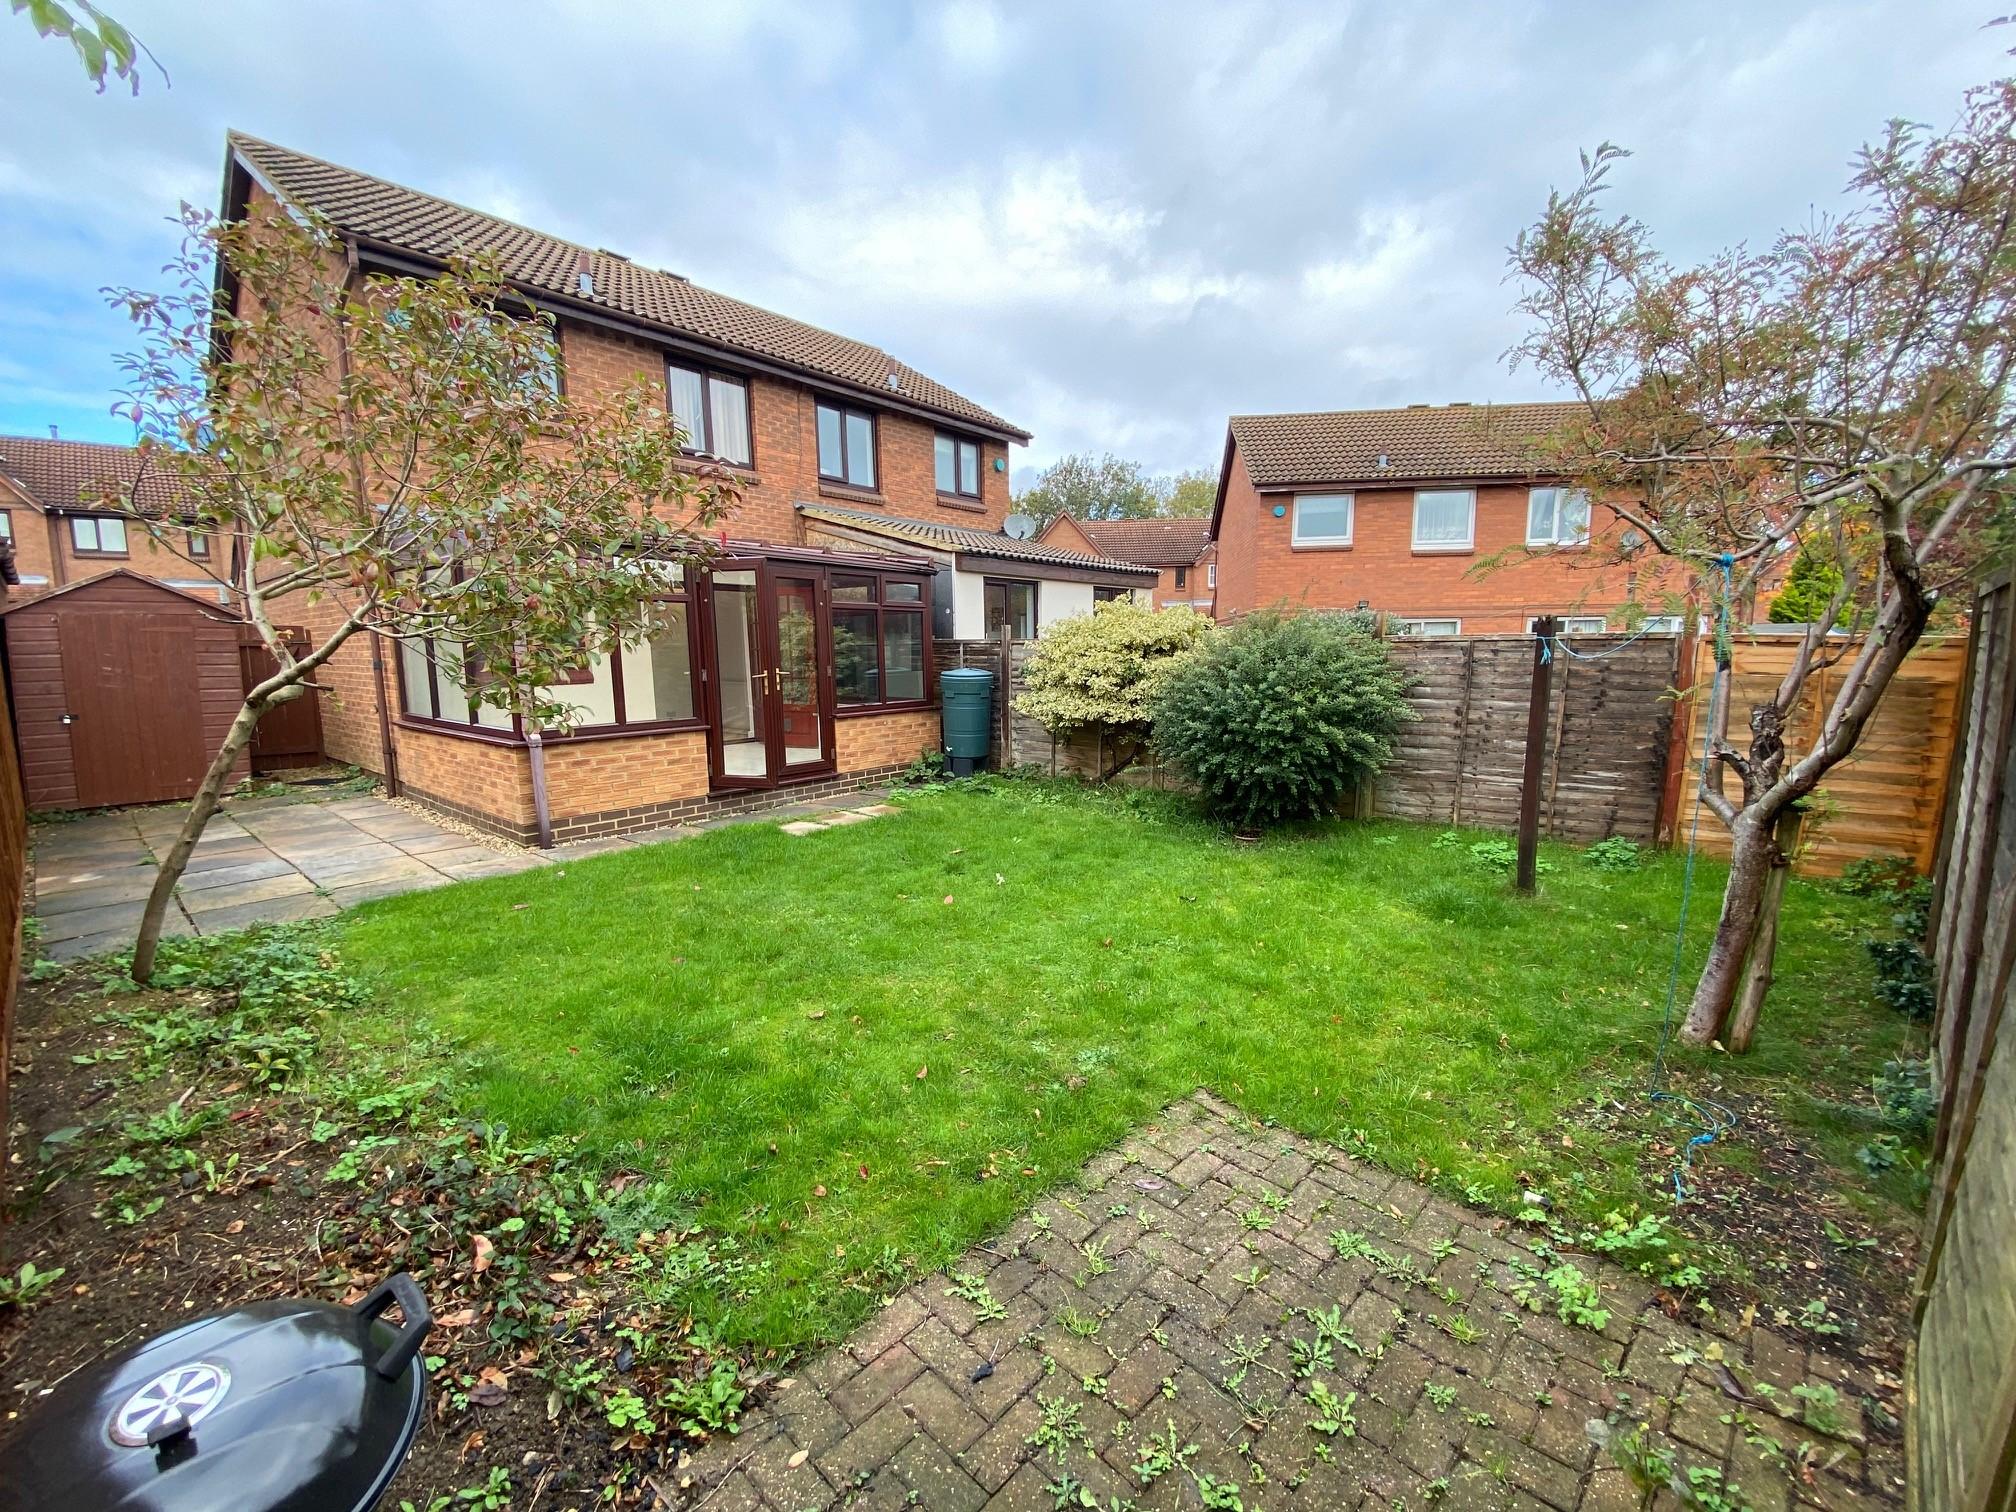 Aintree Close, Milton Keynes, Buckinghamshire Image